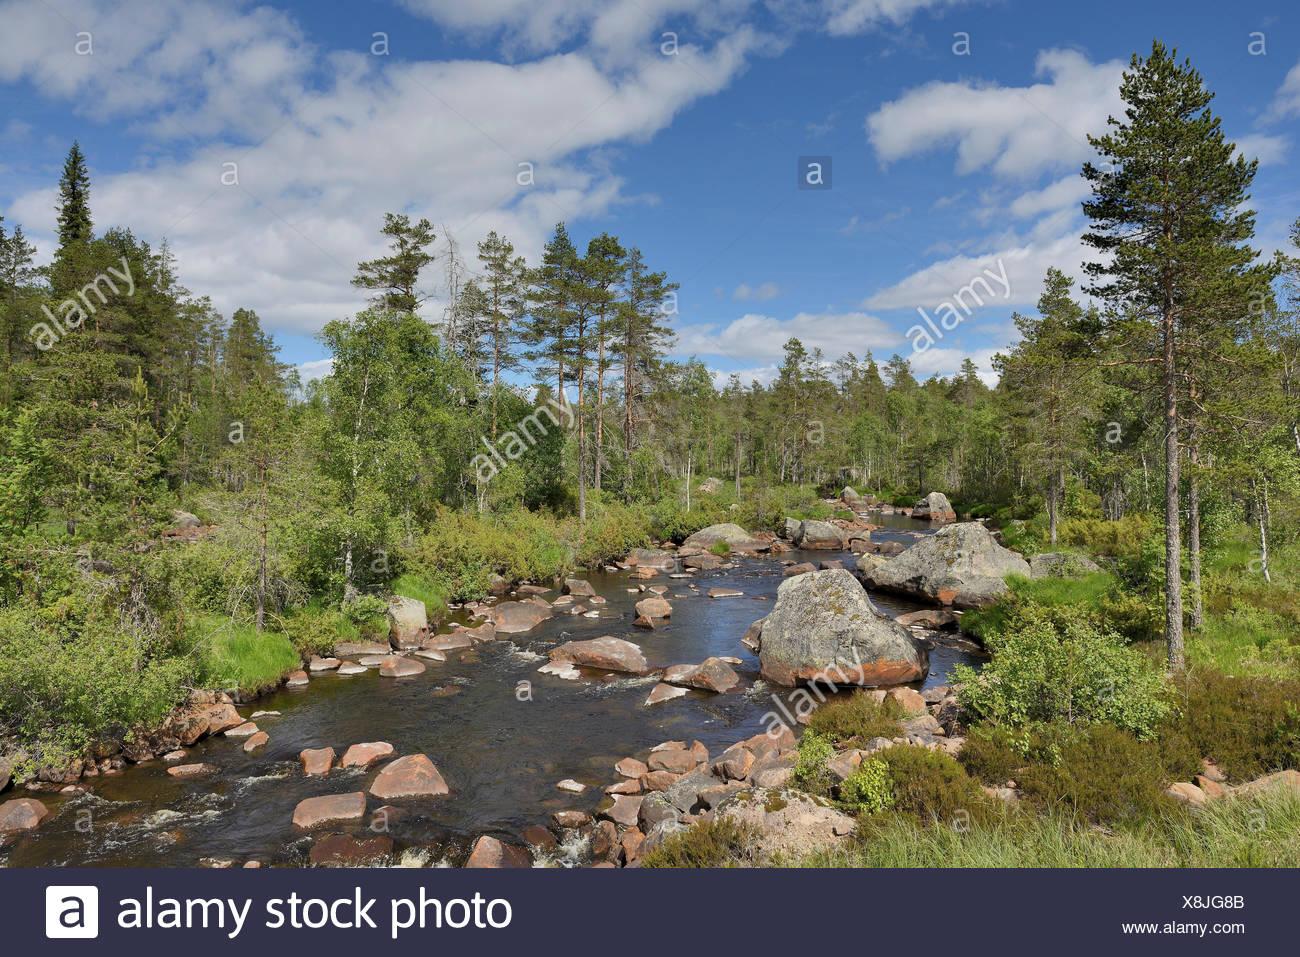 The river Foskan in the province of Dalarna with rocks, Sweden, Dalarna, Långfjällets Naturreservat - Stock Image